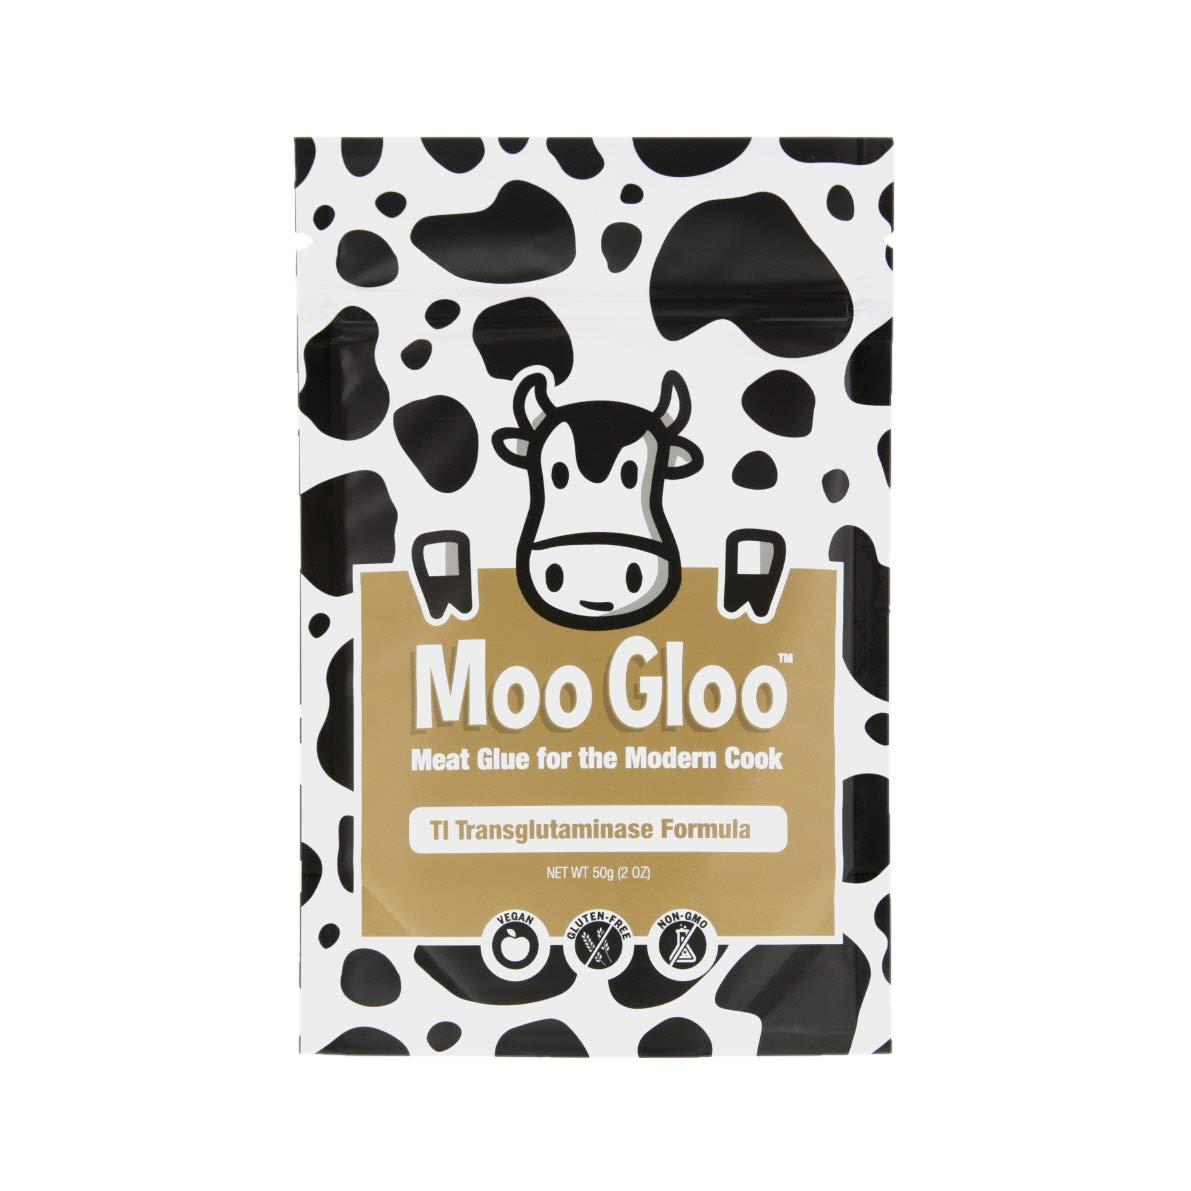 Moo Gloo Transglutaminase [TG, Meat Glue] - TI Formula - 50g/2oz